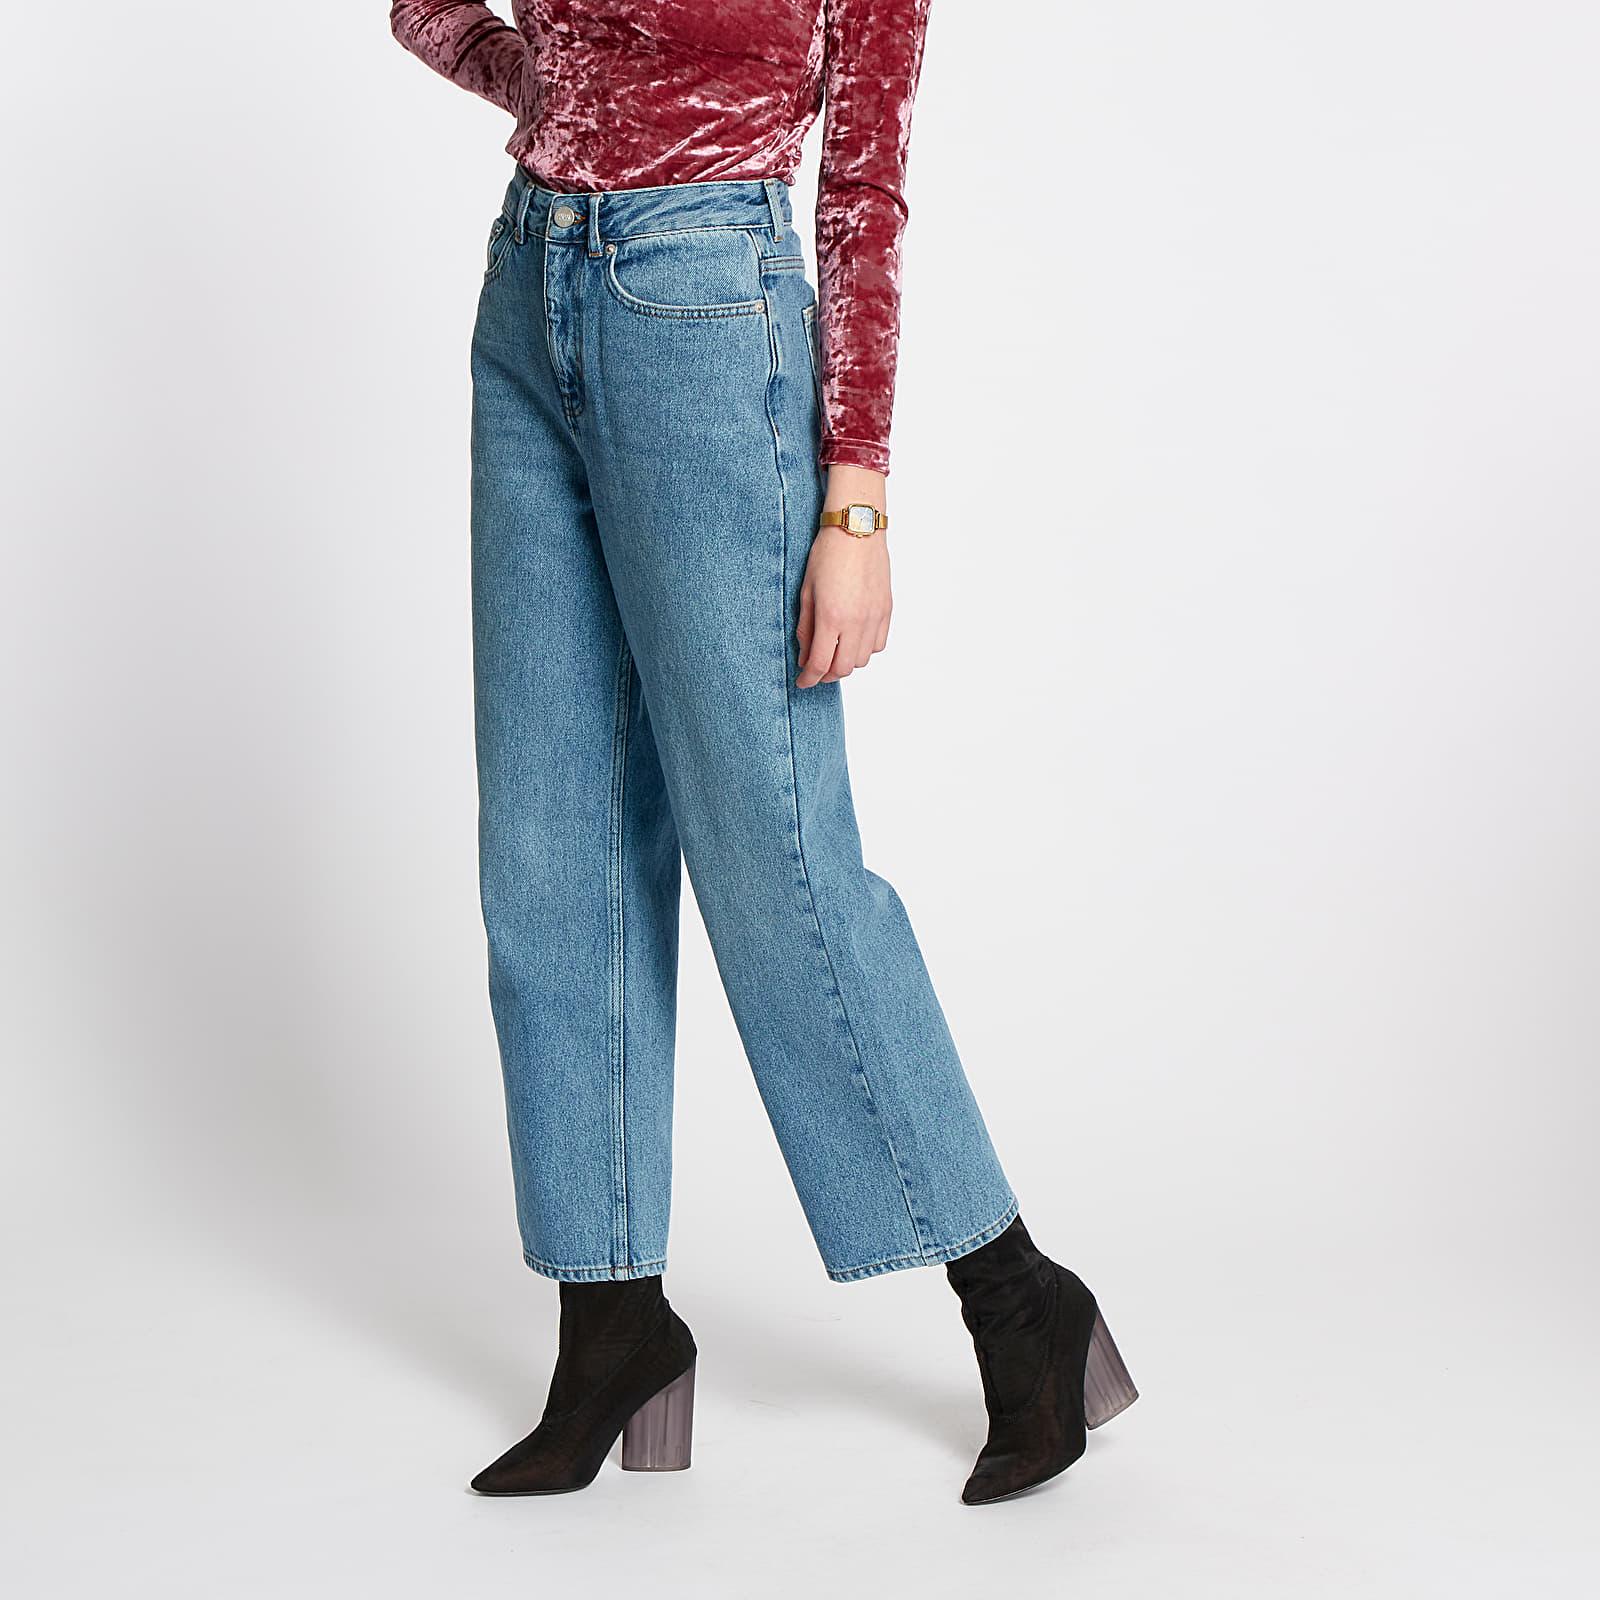 Джинси і штани Wood Wood Ilo Jeans Classic Vintage